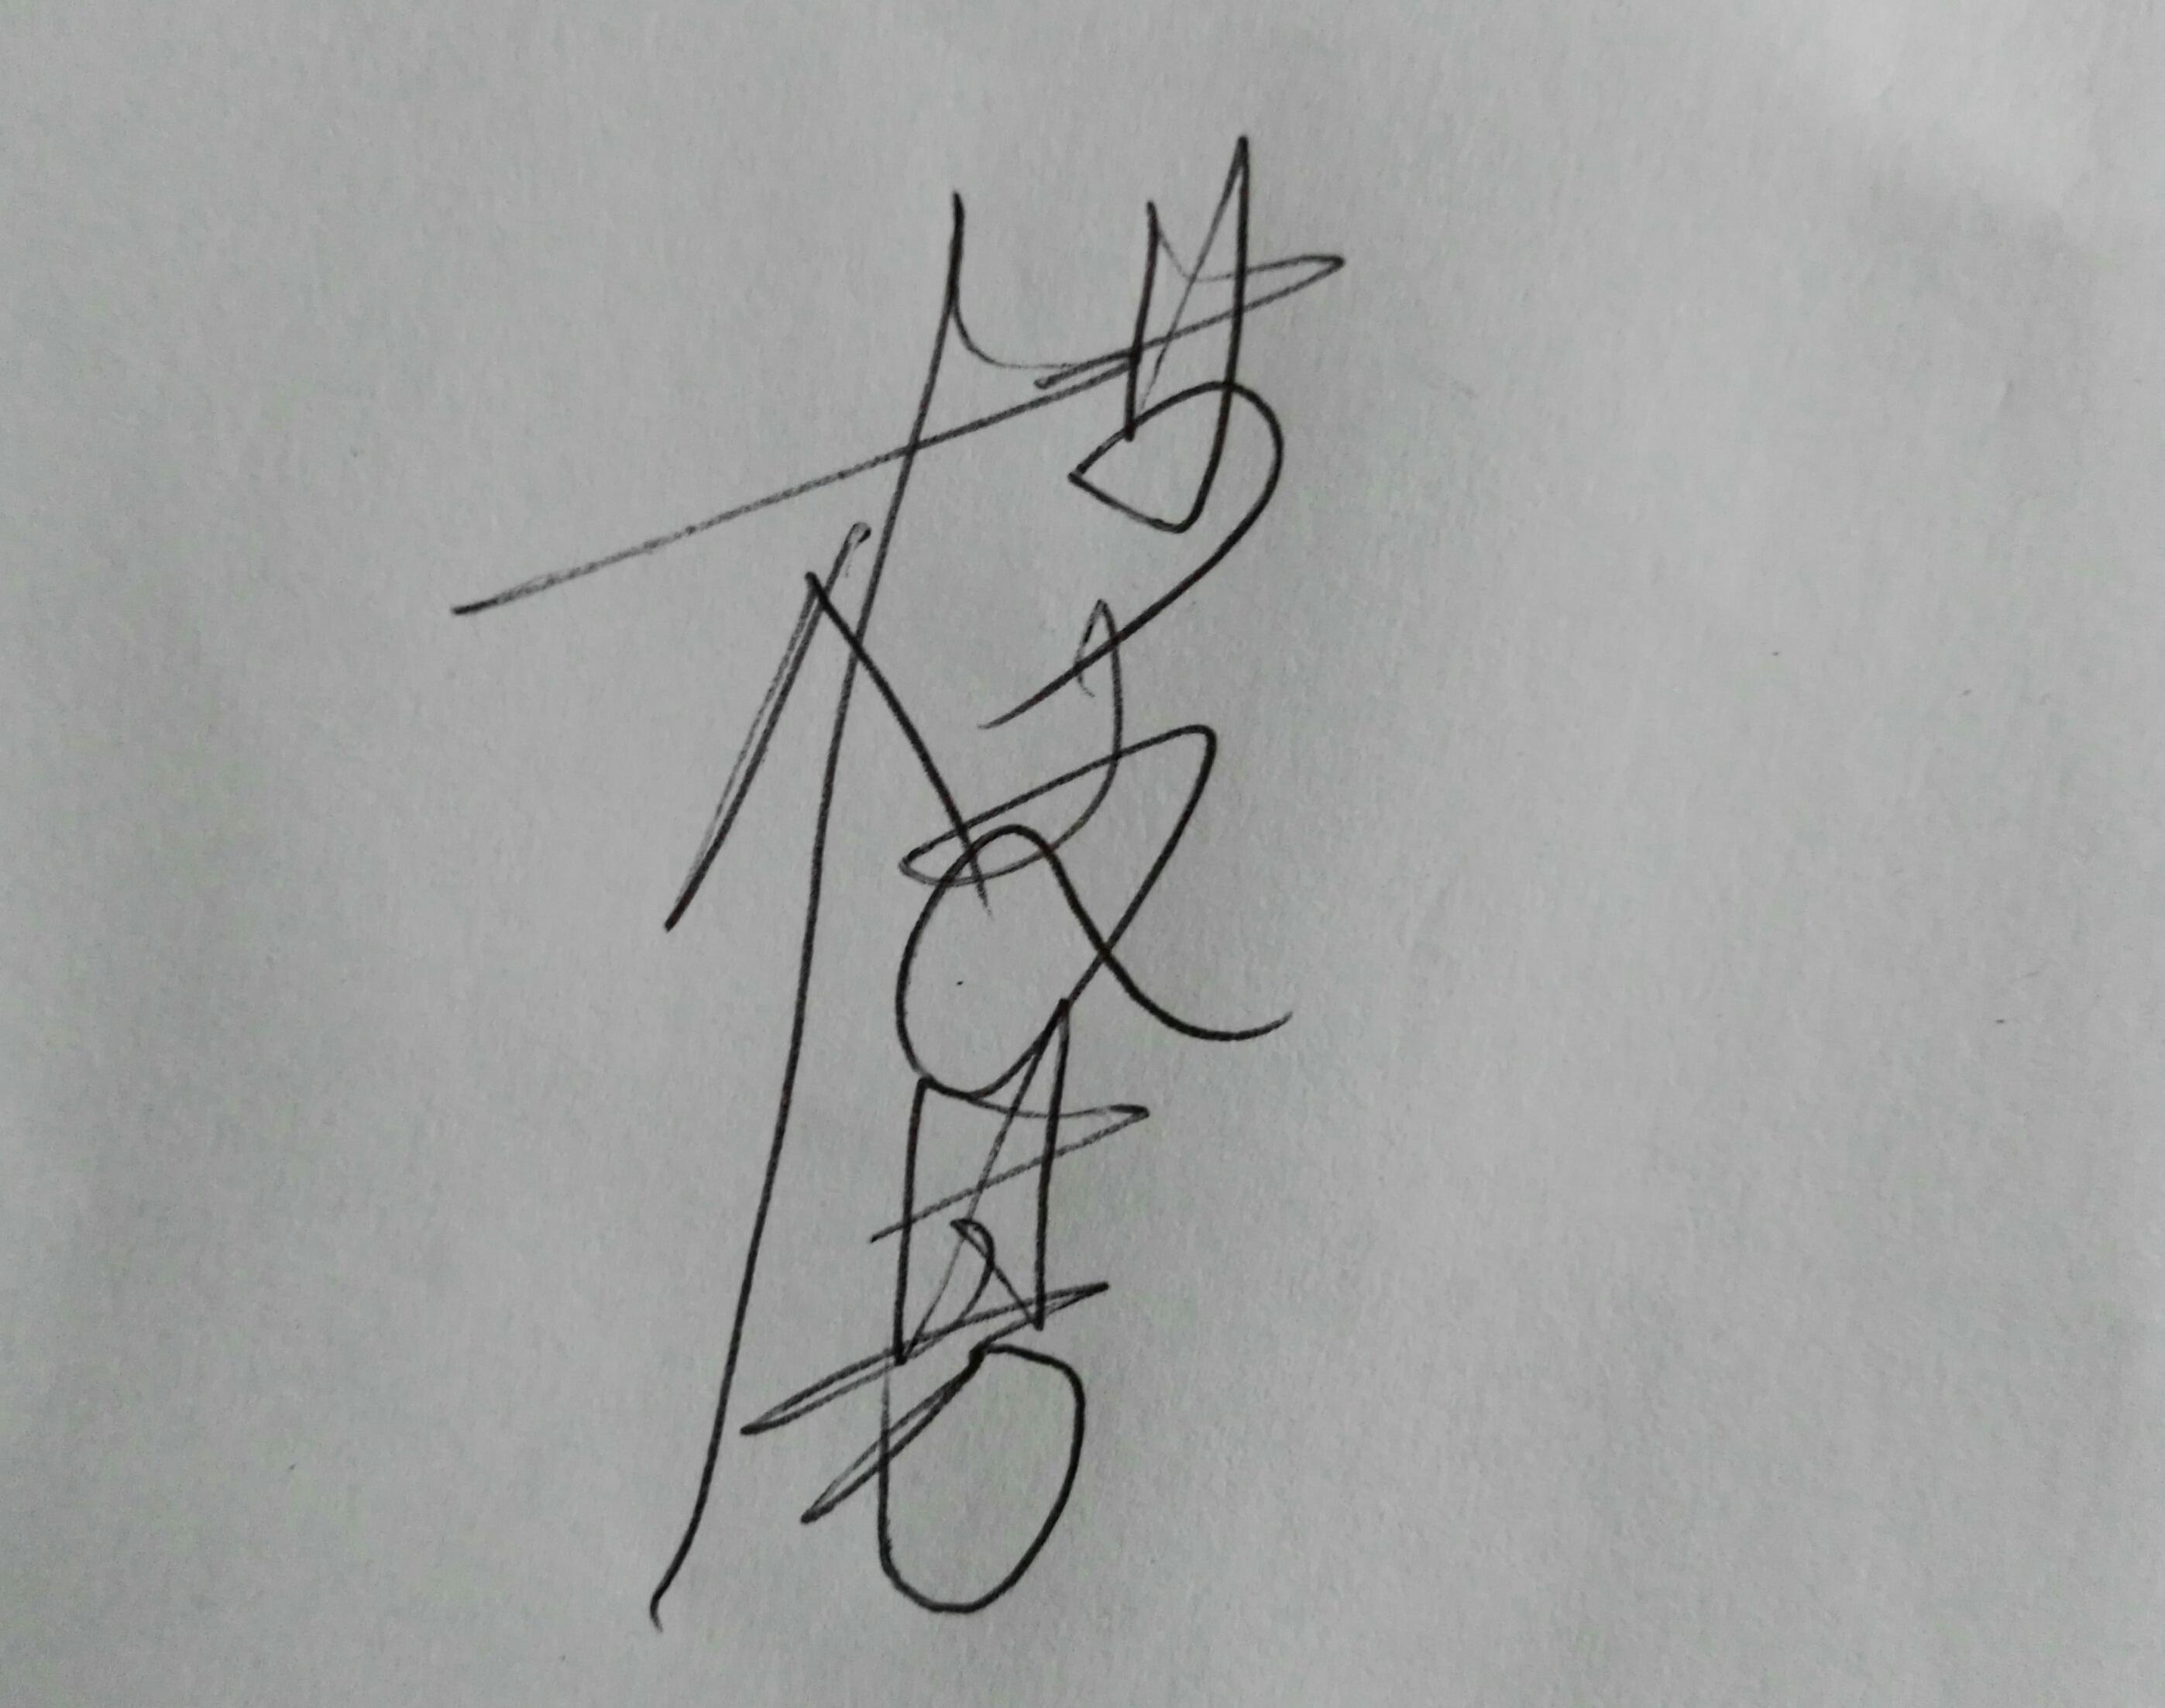 Joyce LimBH's Signature